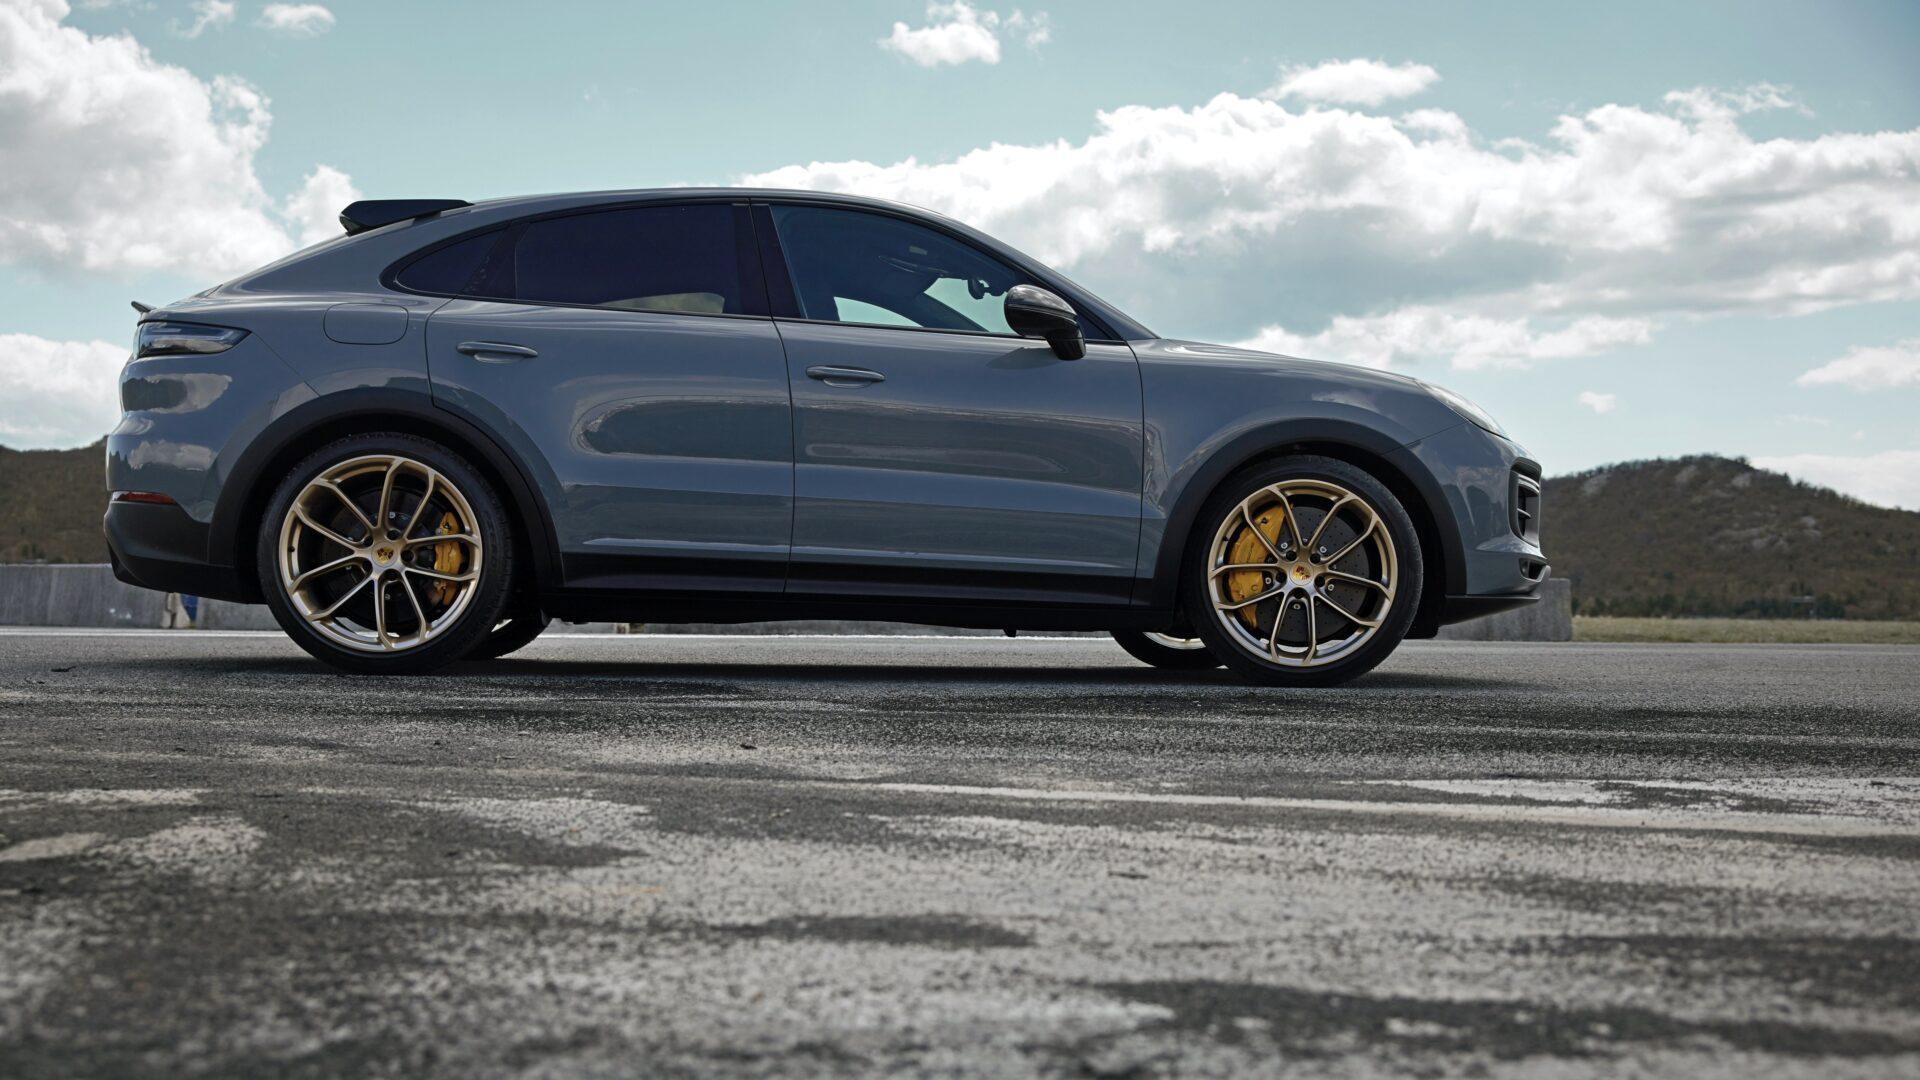 Nuevo Porsche Cayenne Turbo GT perfil